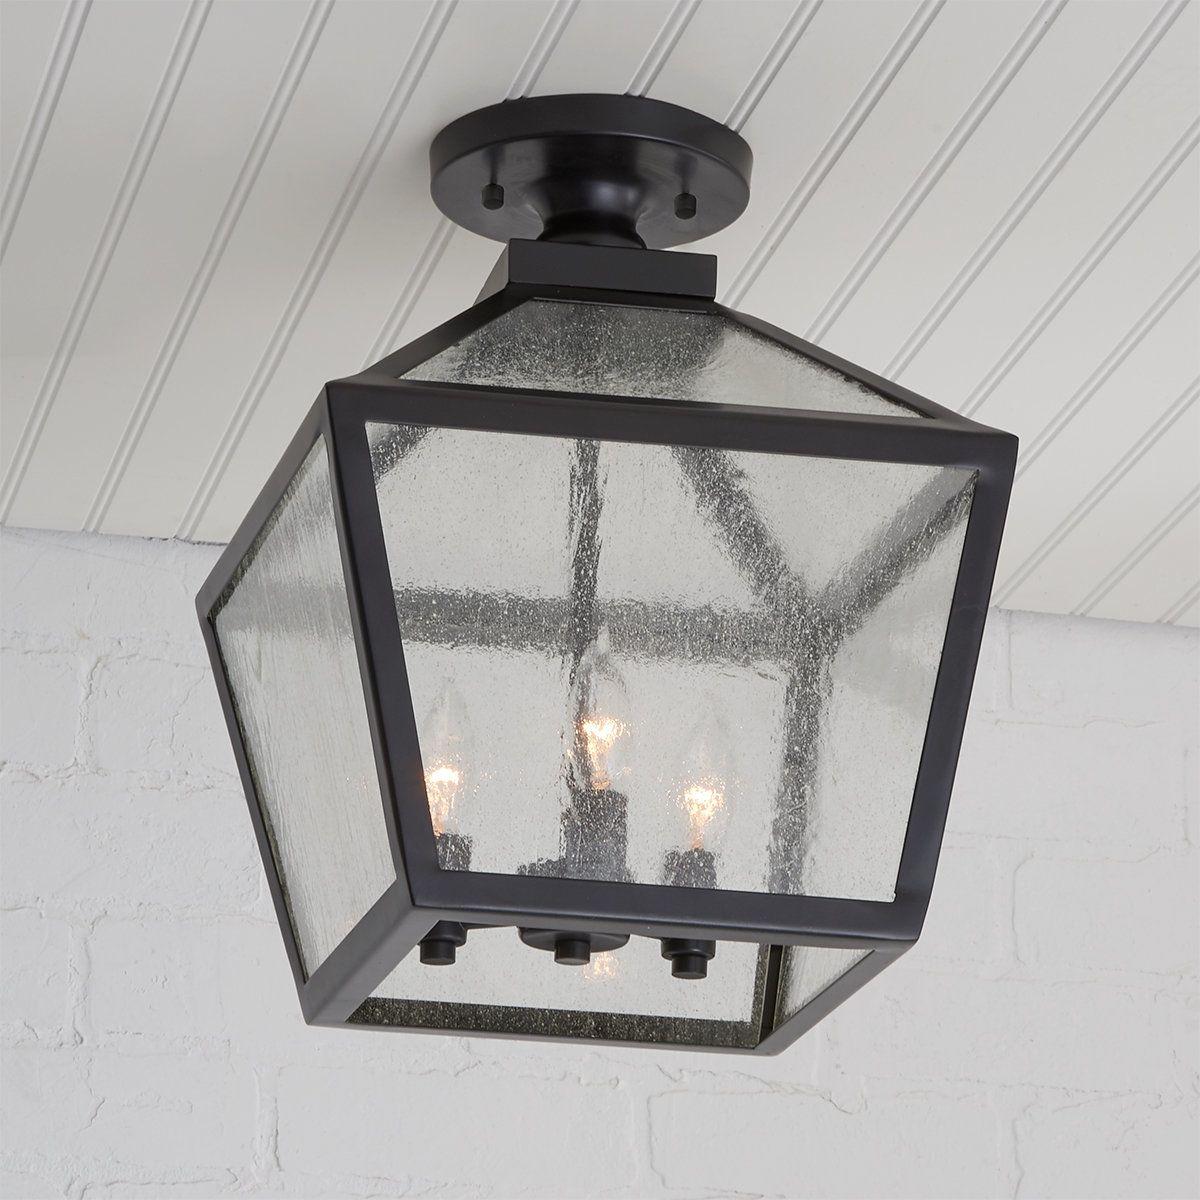 Shenandoah Outdoor Ceiling Light In 2021 Porch Light Fixtures Ceiling Lights Ceiling Mount Light Fixtures